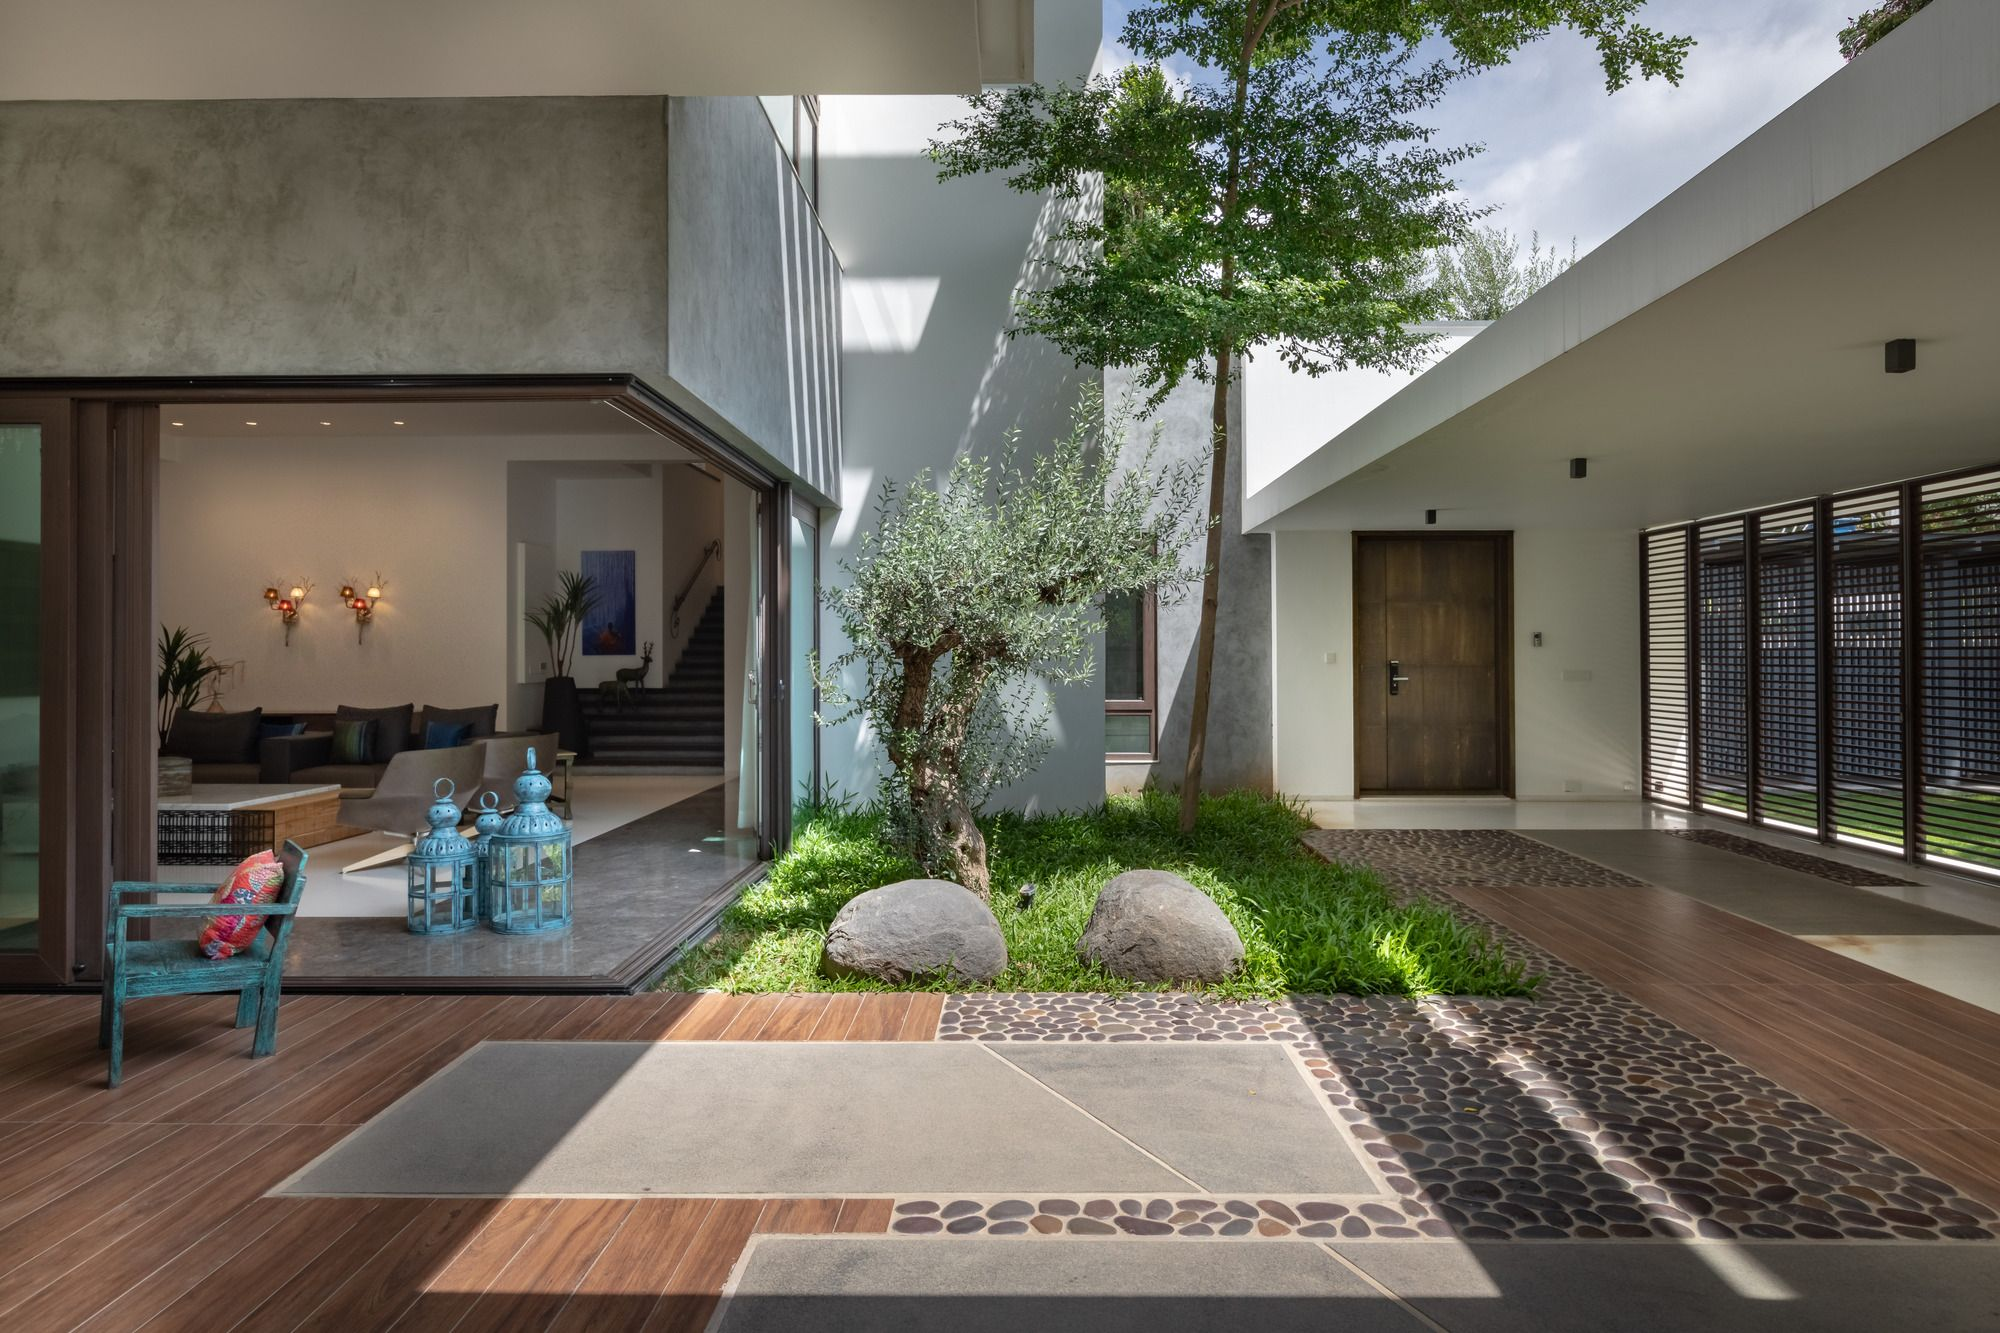 Courtyard Villa / MORIQ Courtyard design, Modern